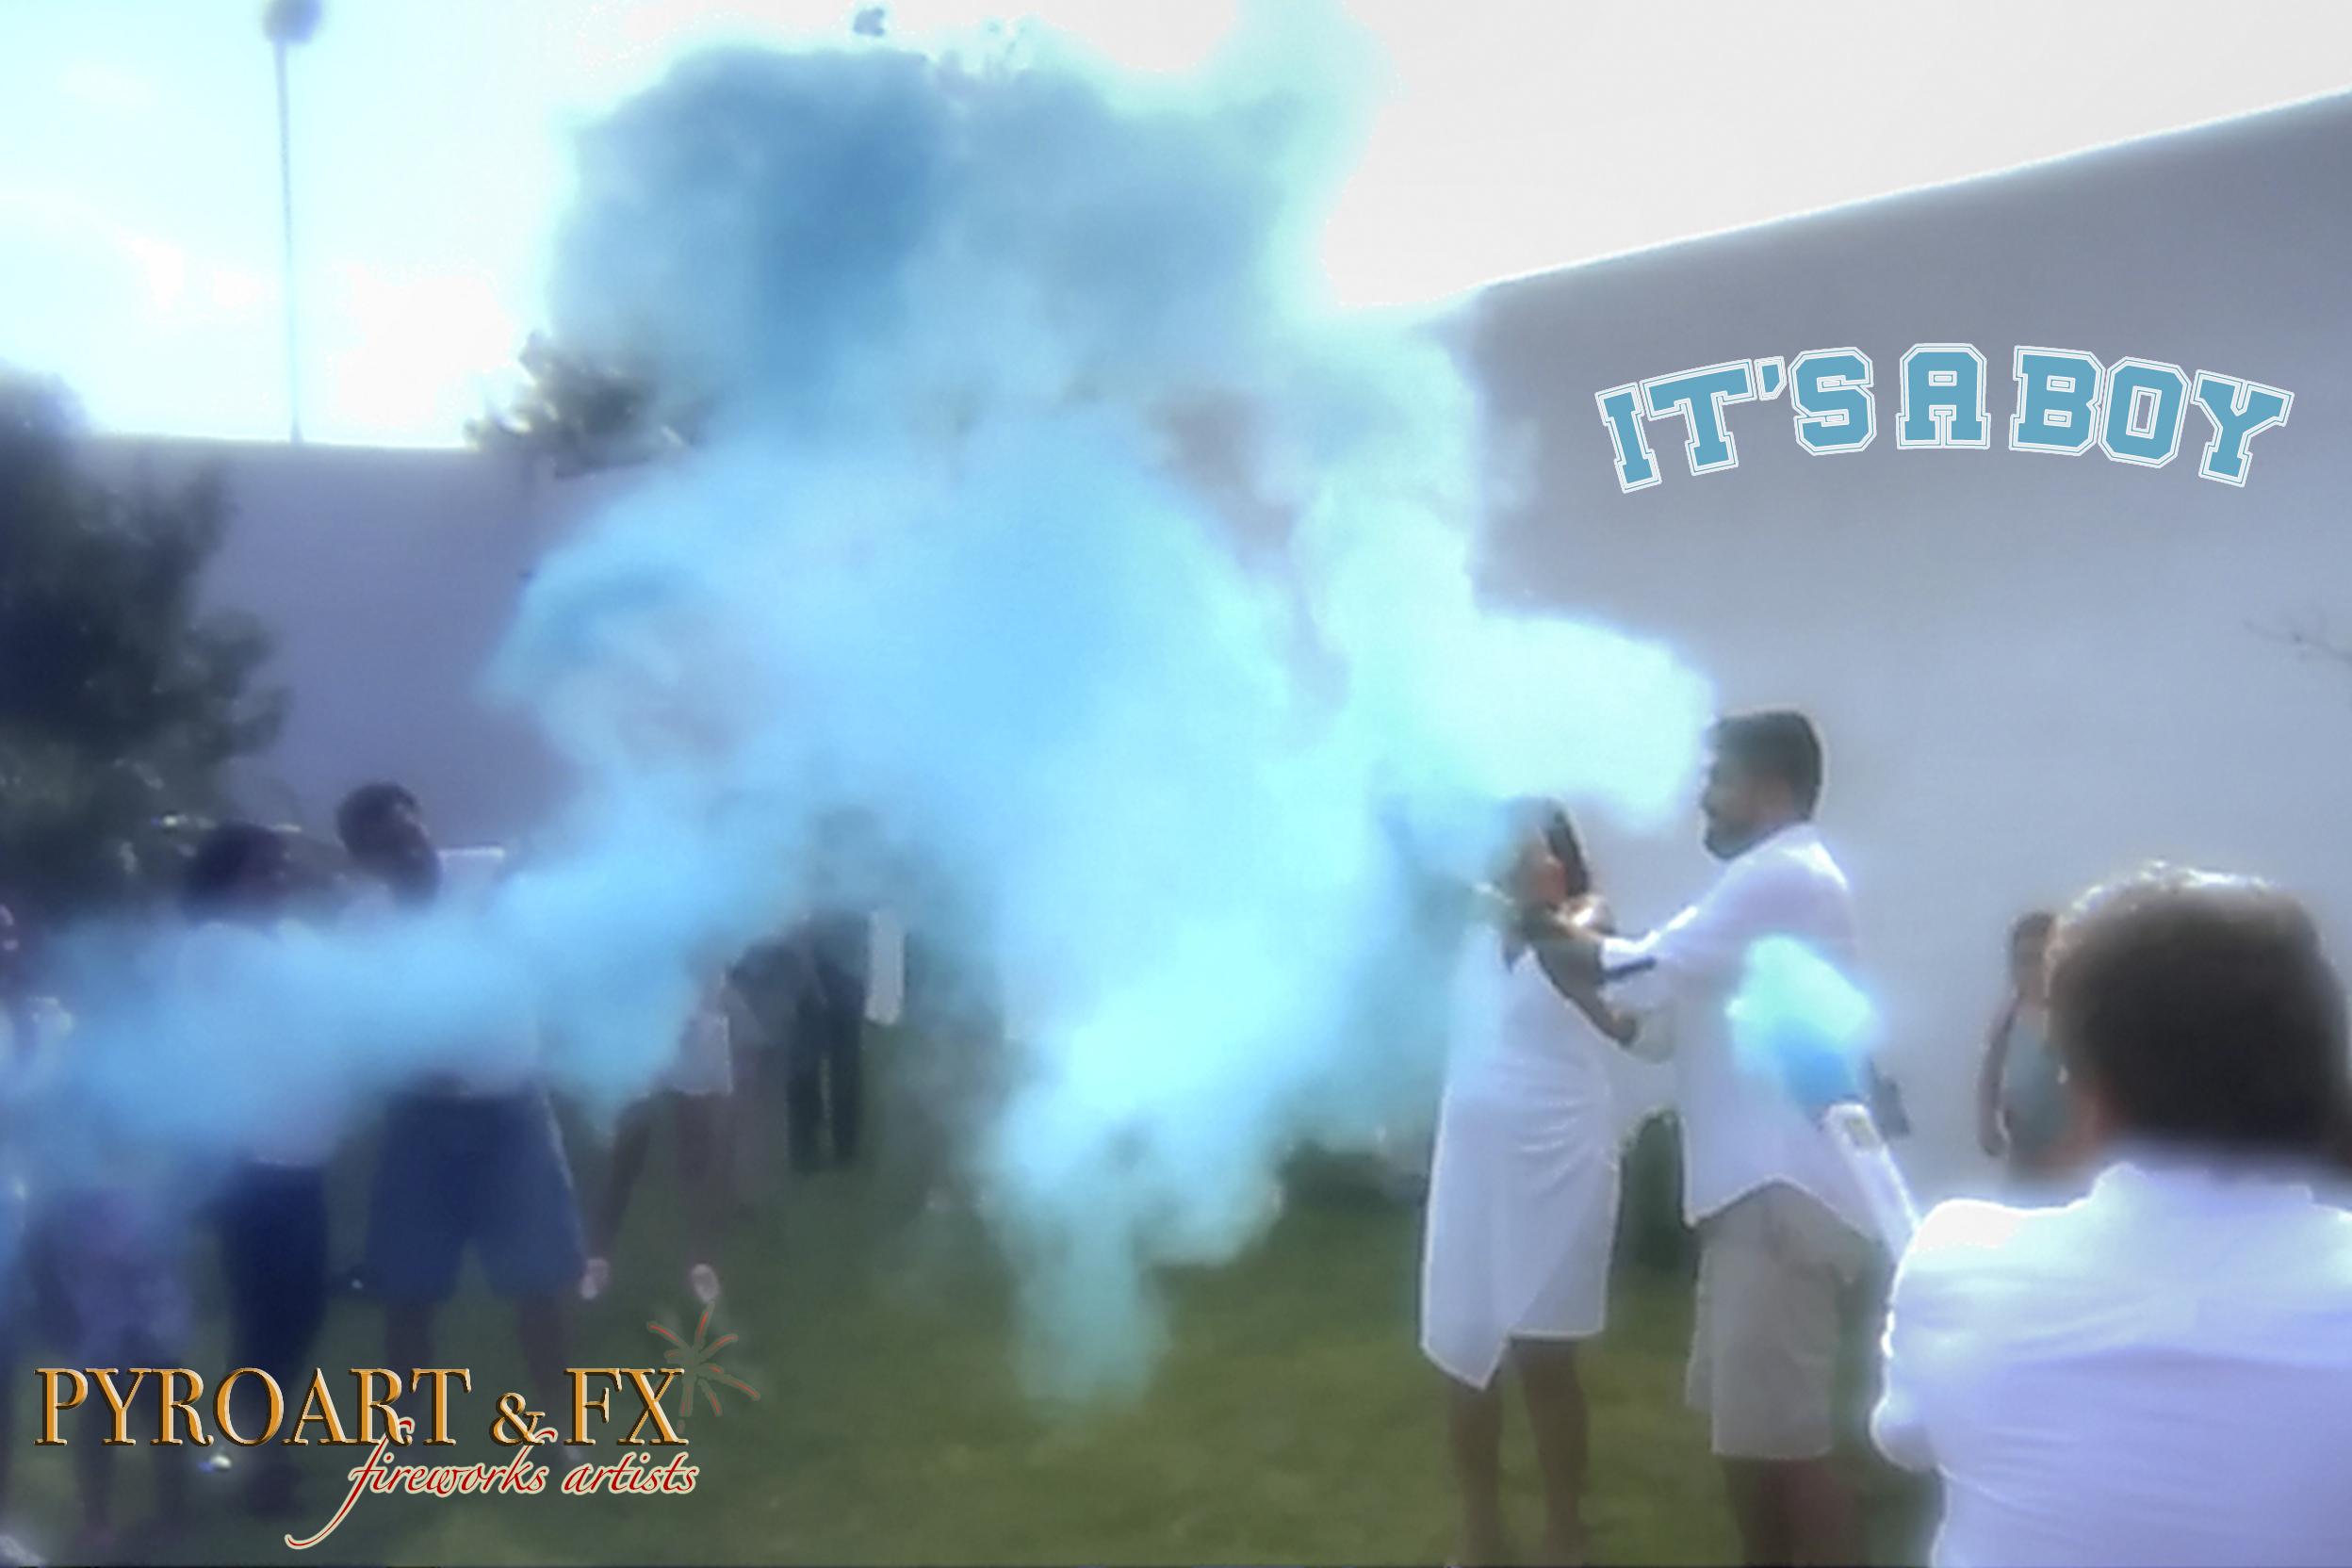 PYROART & FX - HDR POLVO AZUL